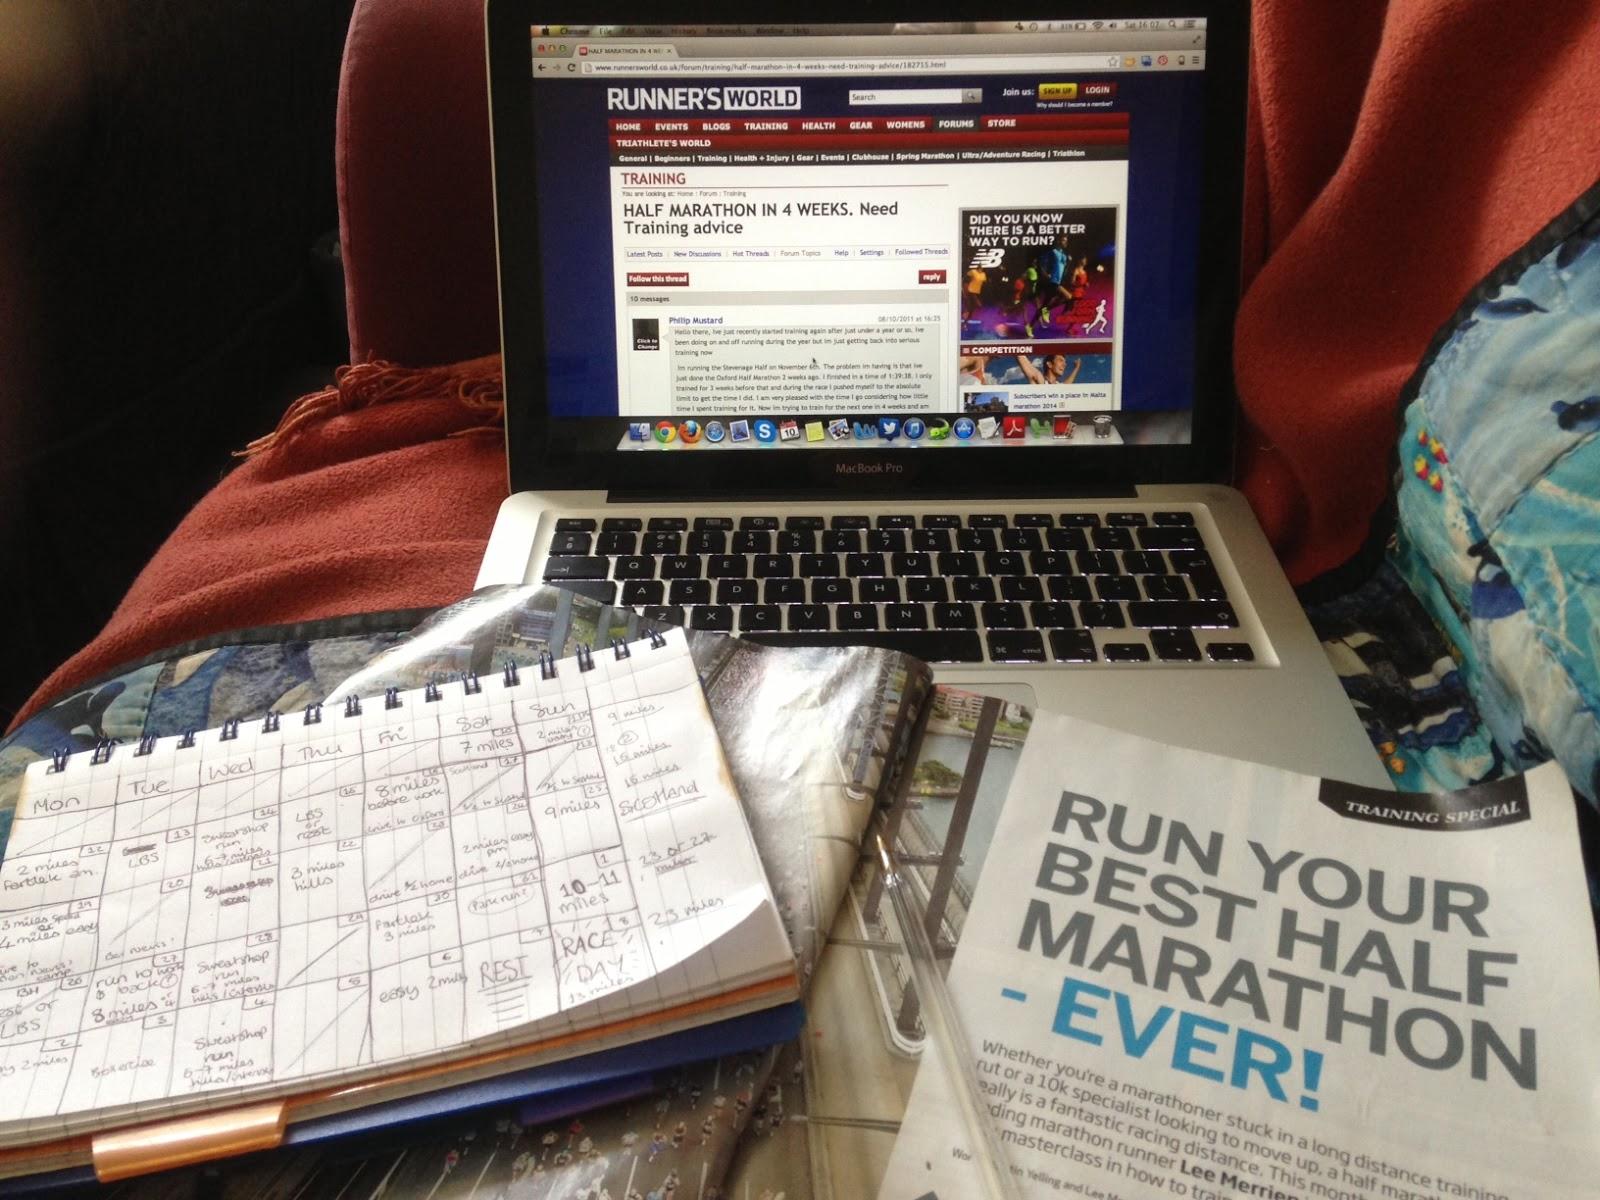 4 week half marathon training plan